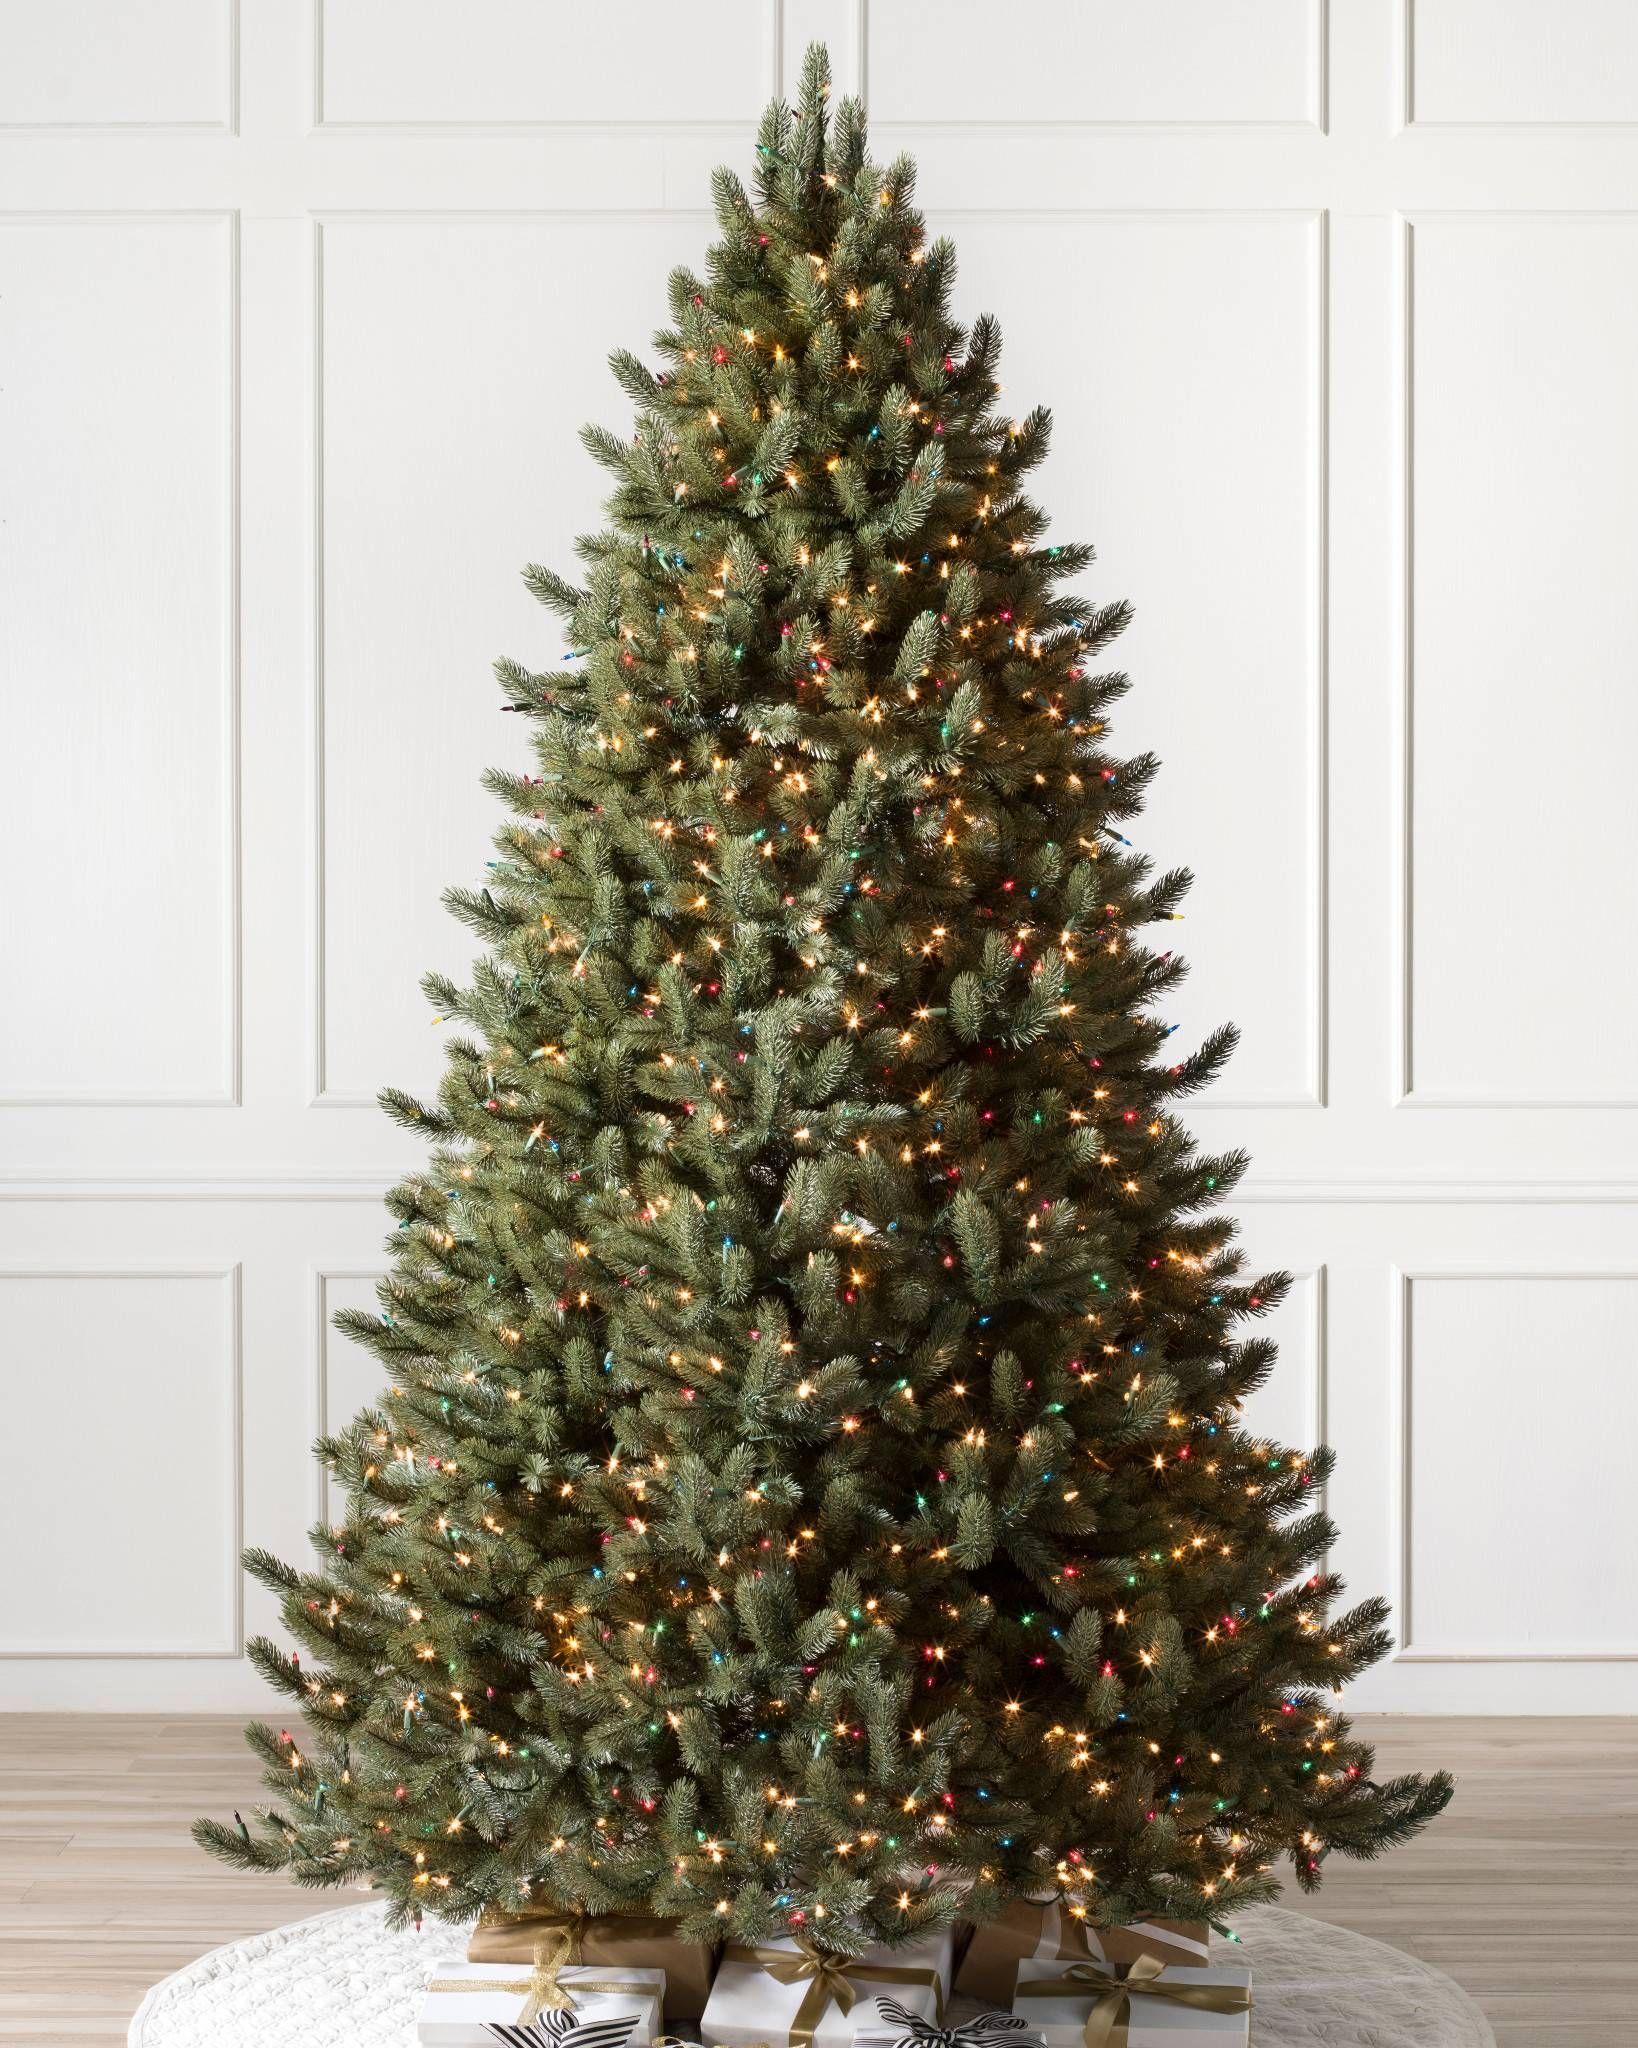 Vermont White Spruce Span Holidays Fir